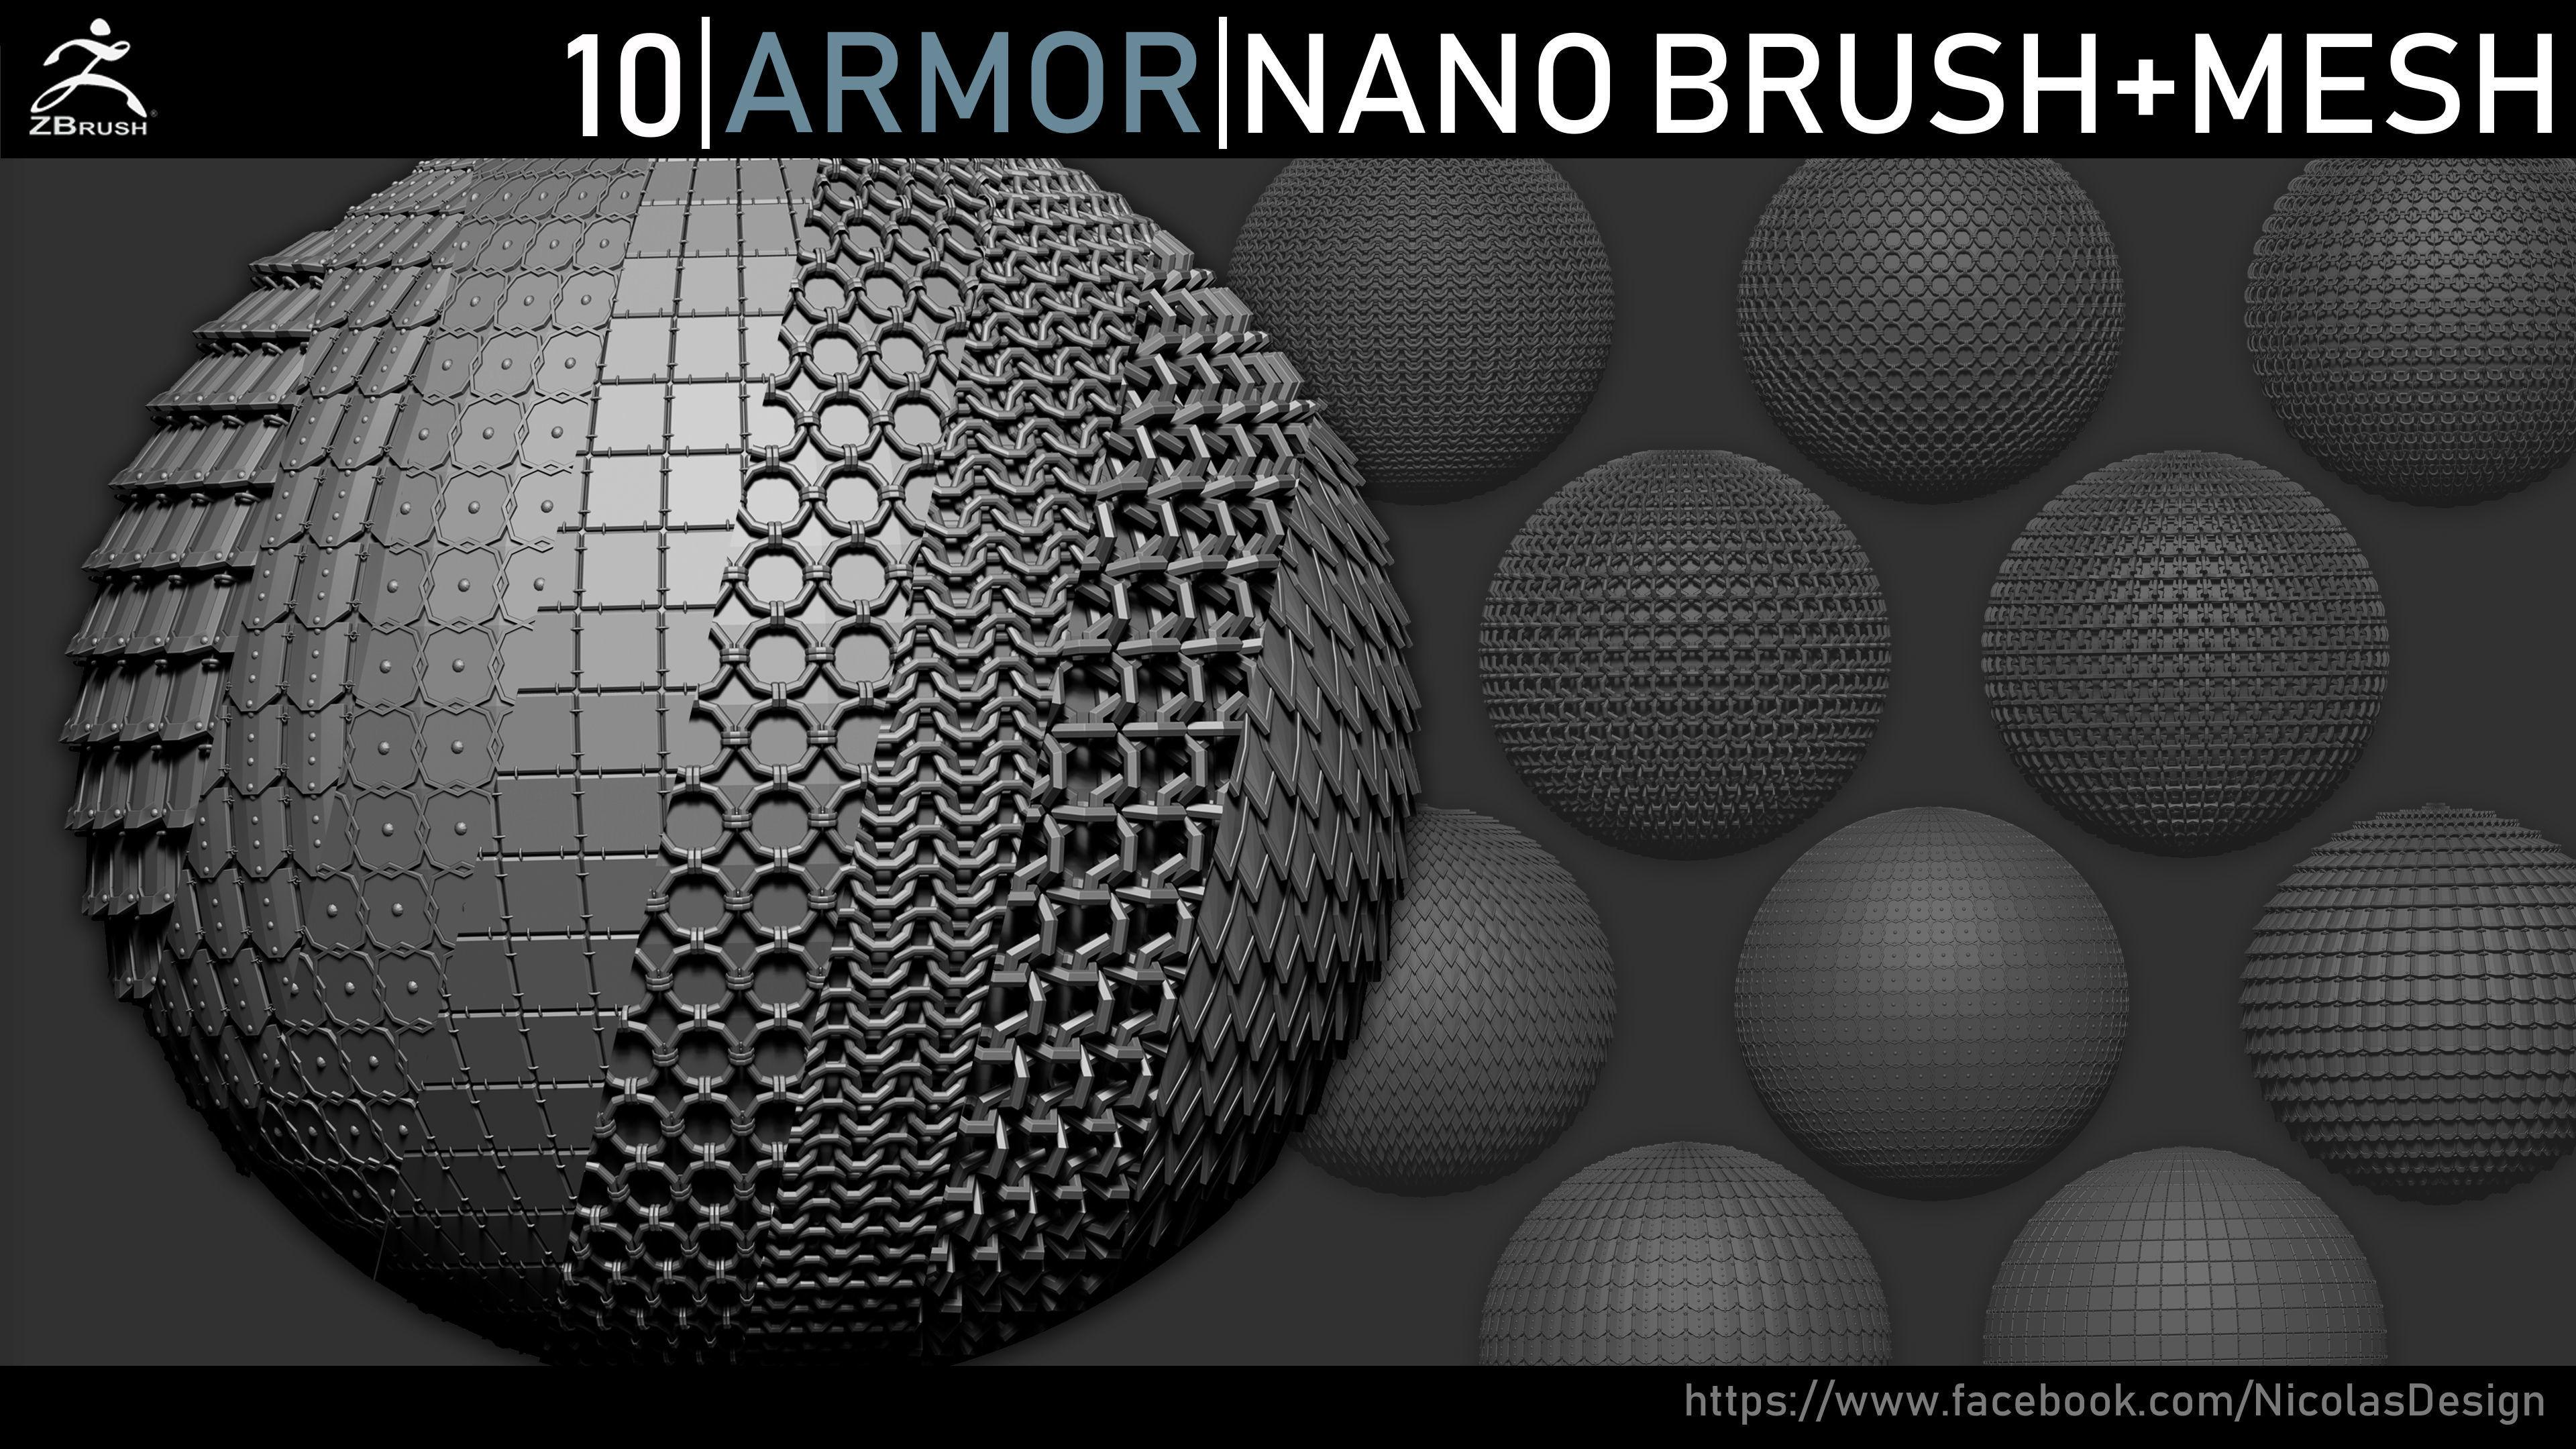 Zbrush - Armor Nano Brush and Meshes | 3D model